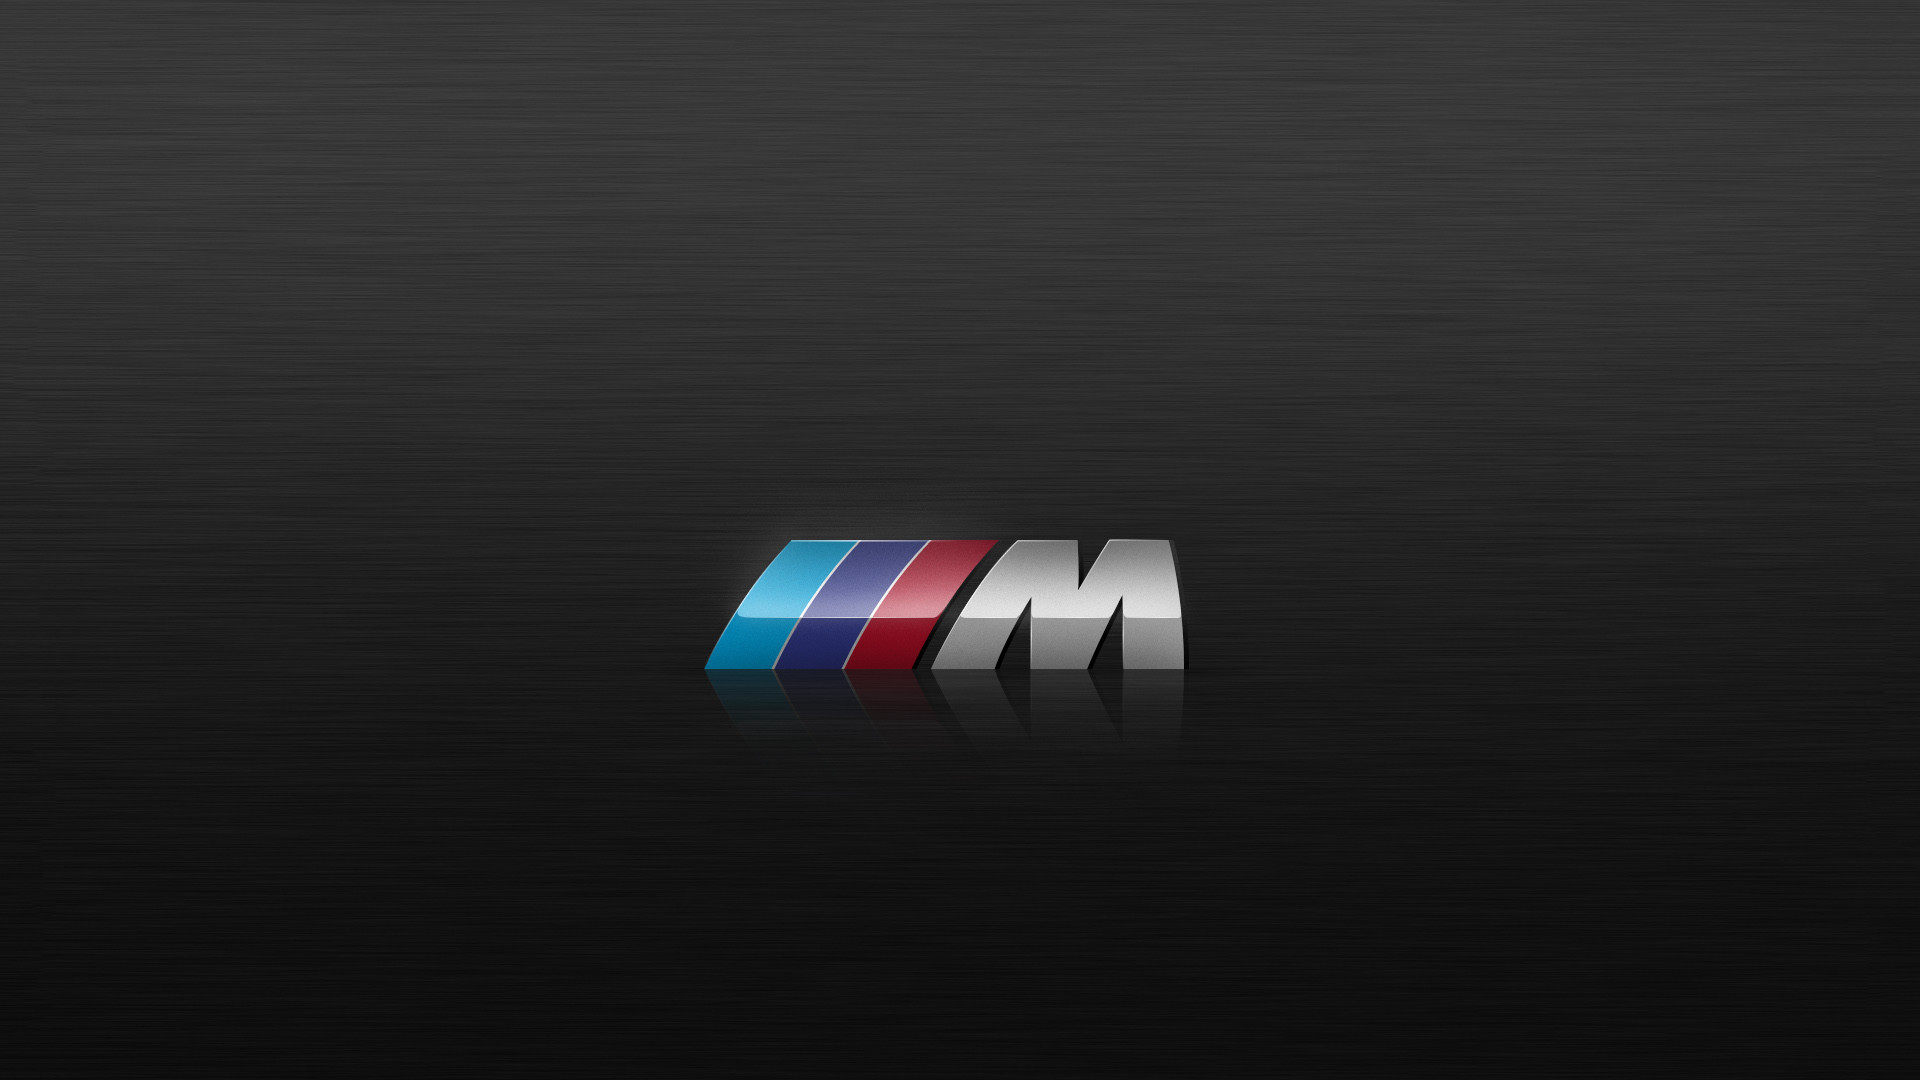 Bmw Logo Hd Wallpaper 70 Images